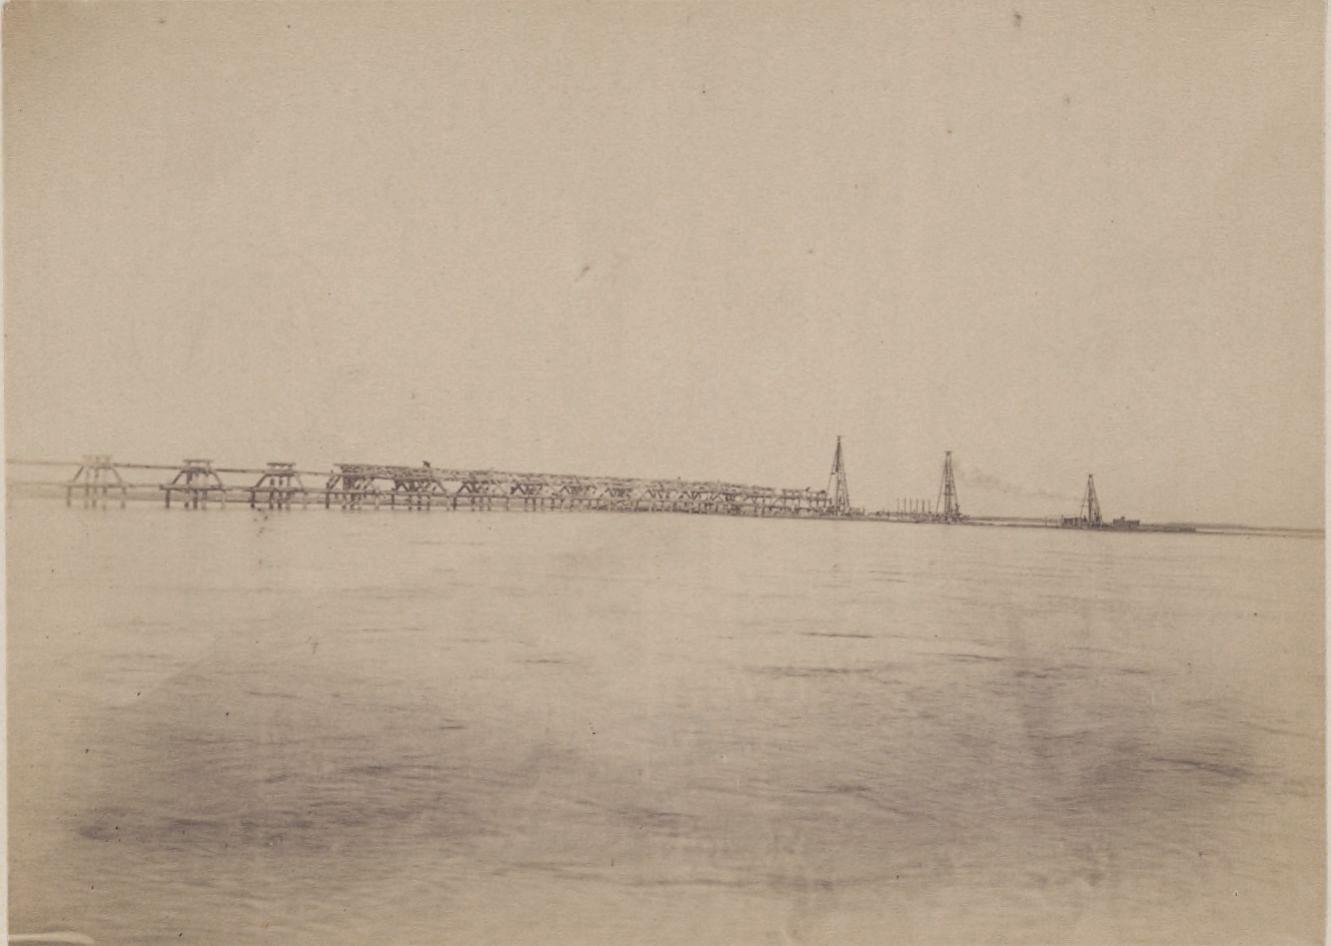 07. Амударья. Мост. Общий вид